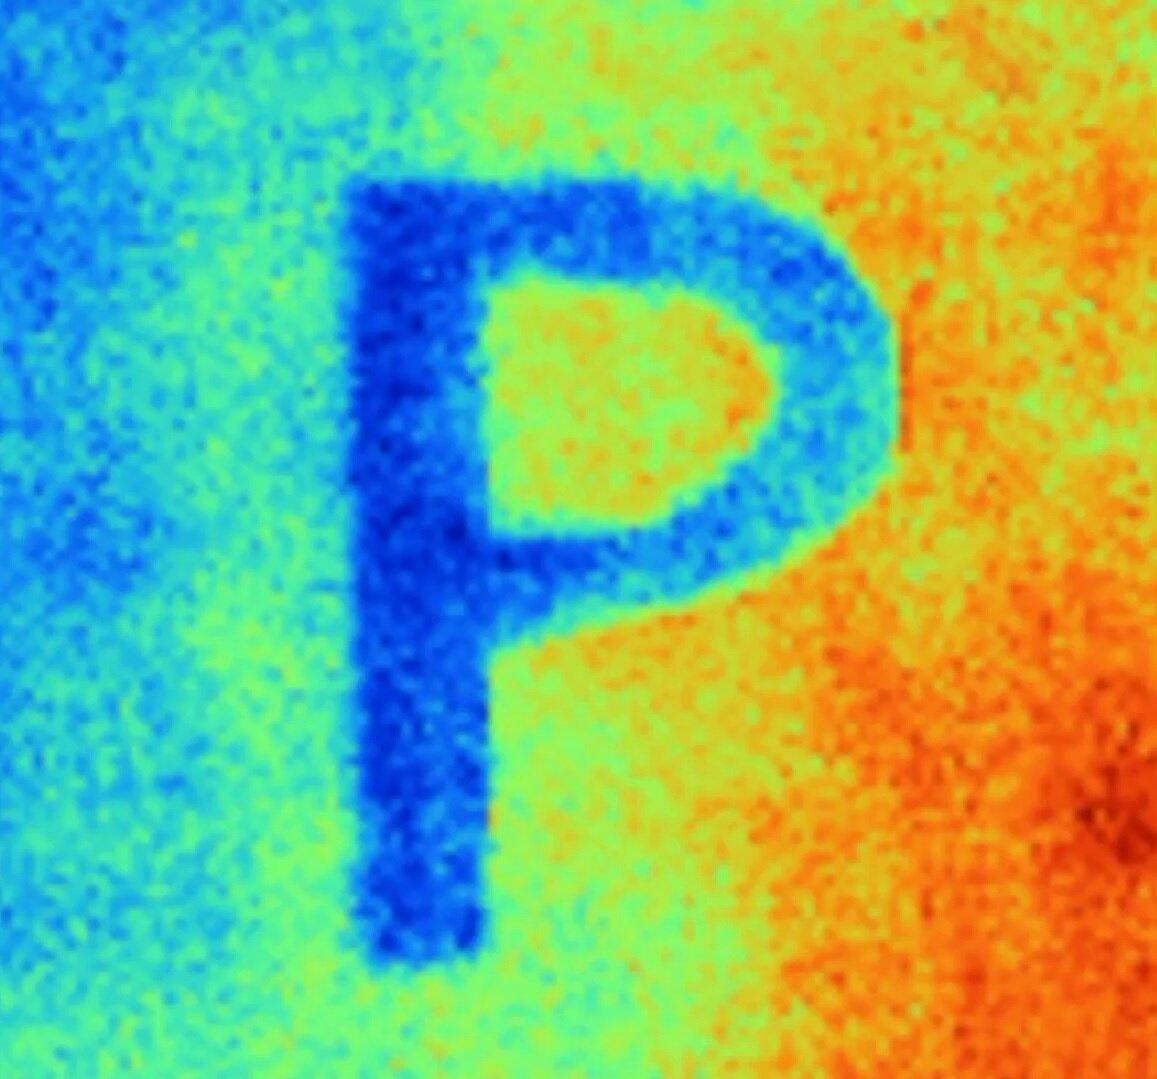 Super-White Paint Keeps Surfaces Cooler Than Surroundings, Even Under Direct Sunlight